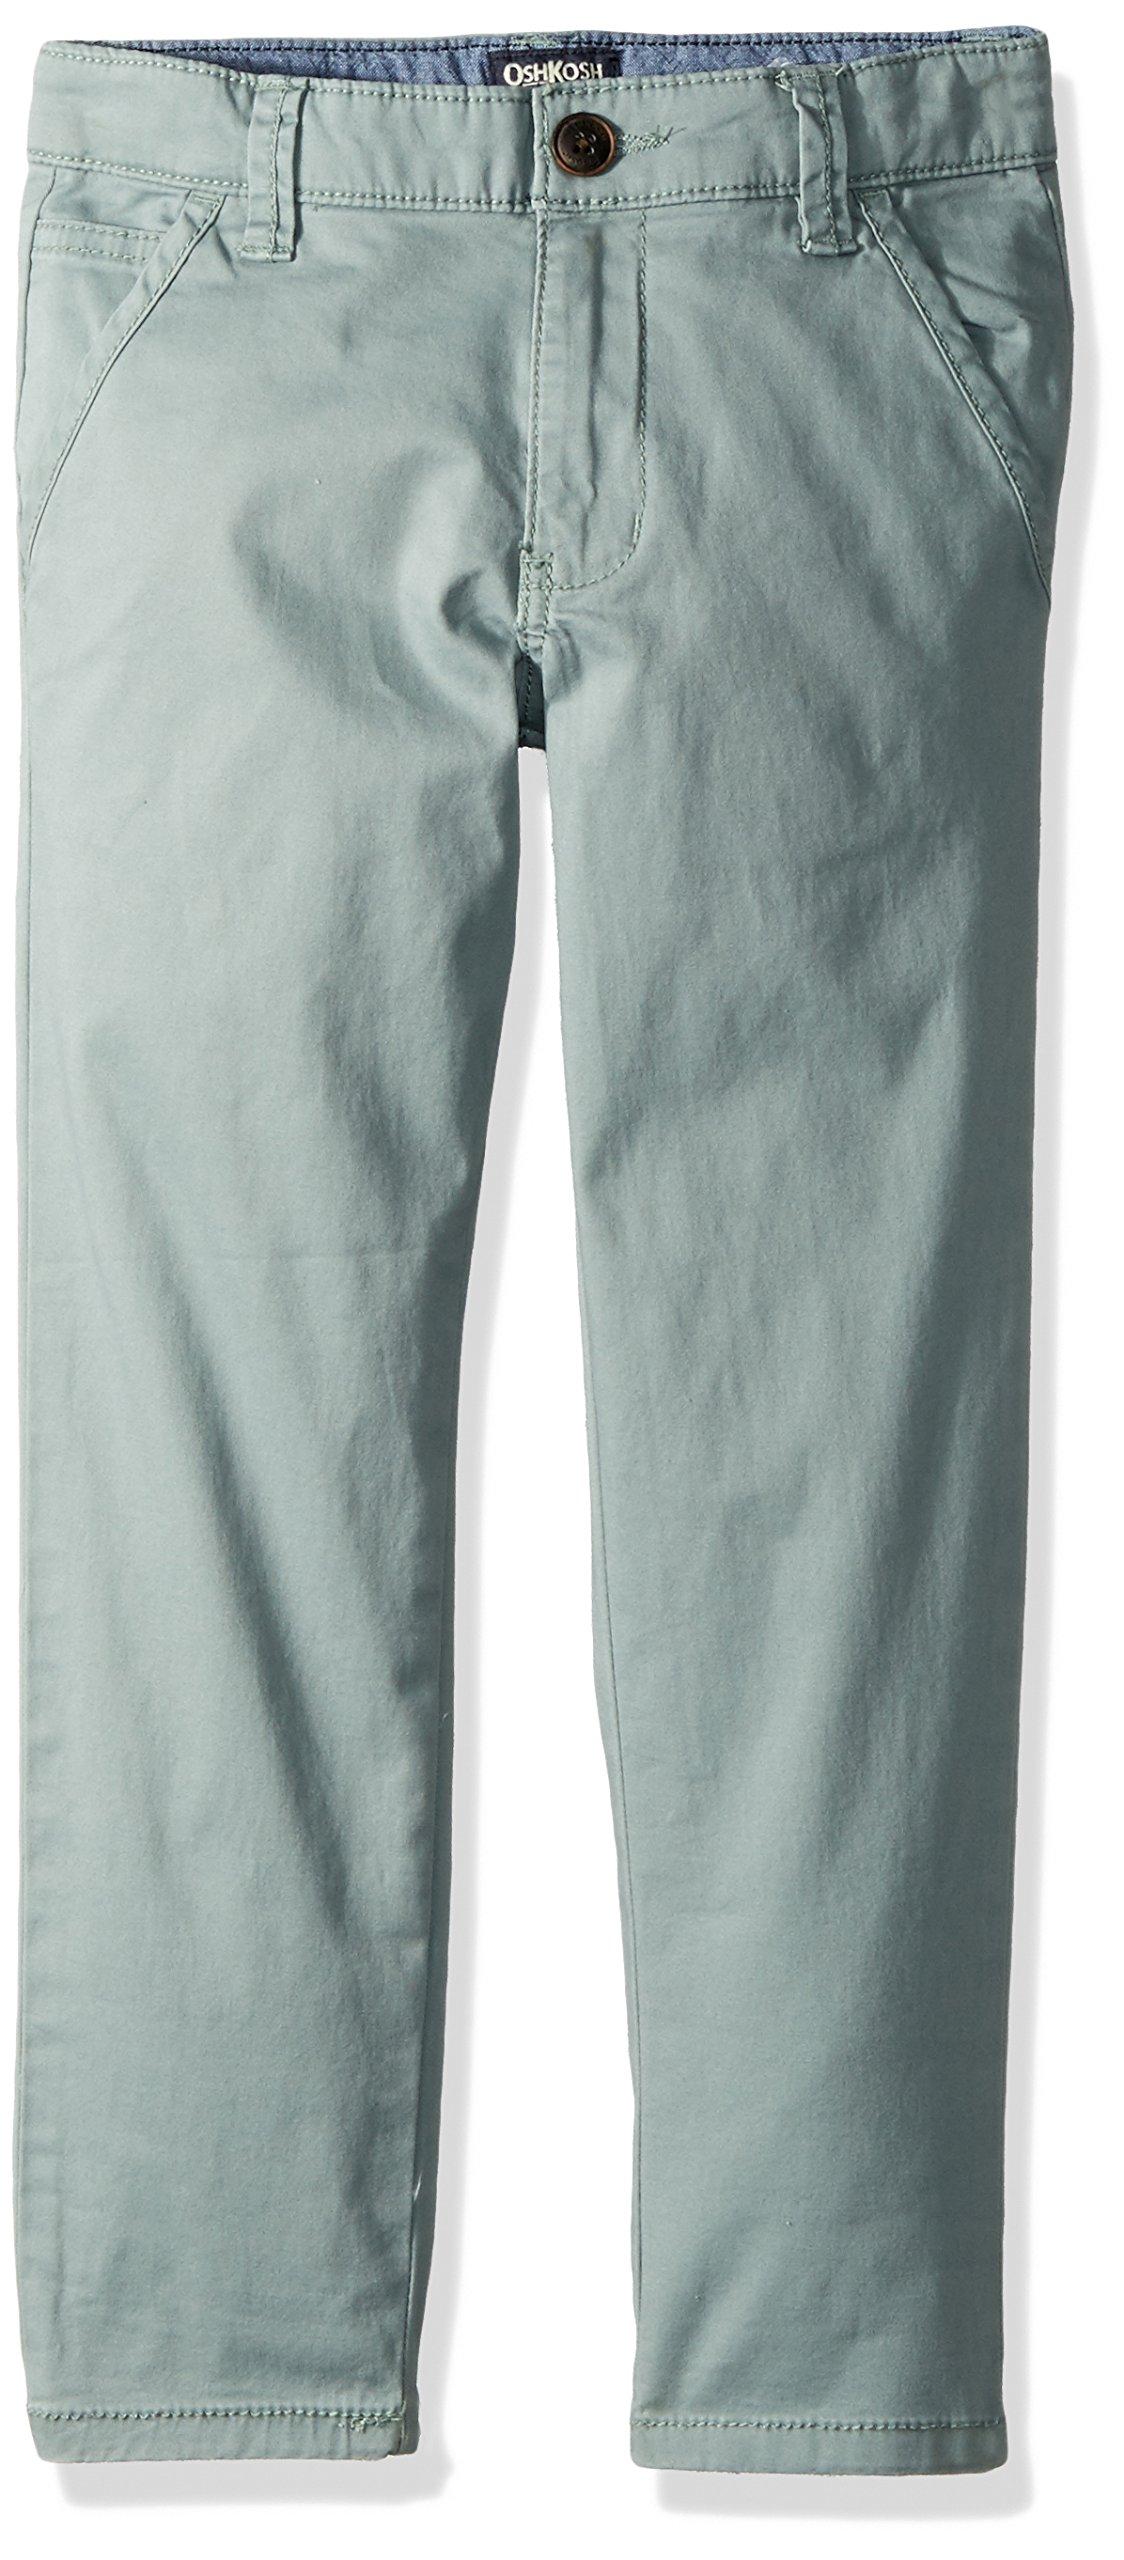 OshKosh B'Gosh Boys' Woven Pant 31813912, Green, 7 Kids